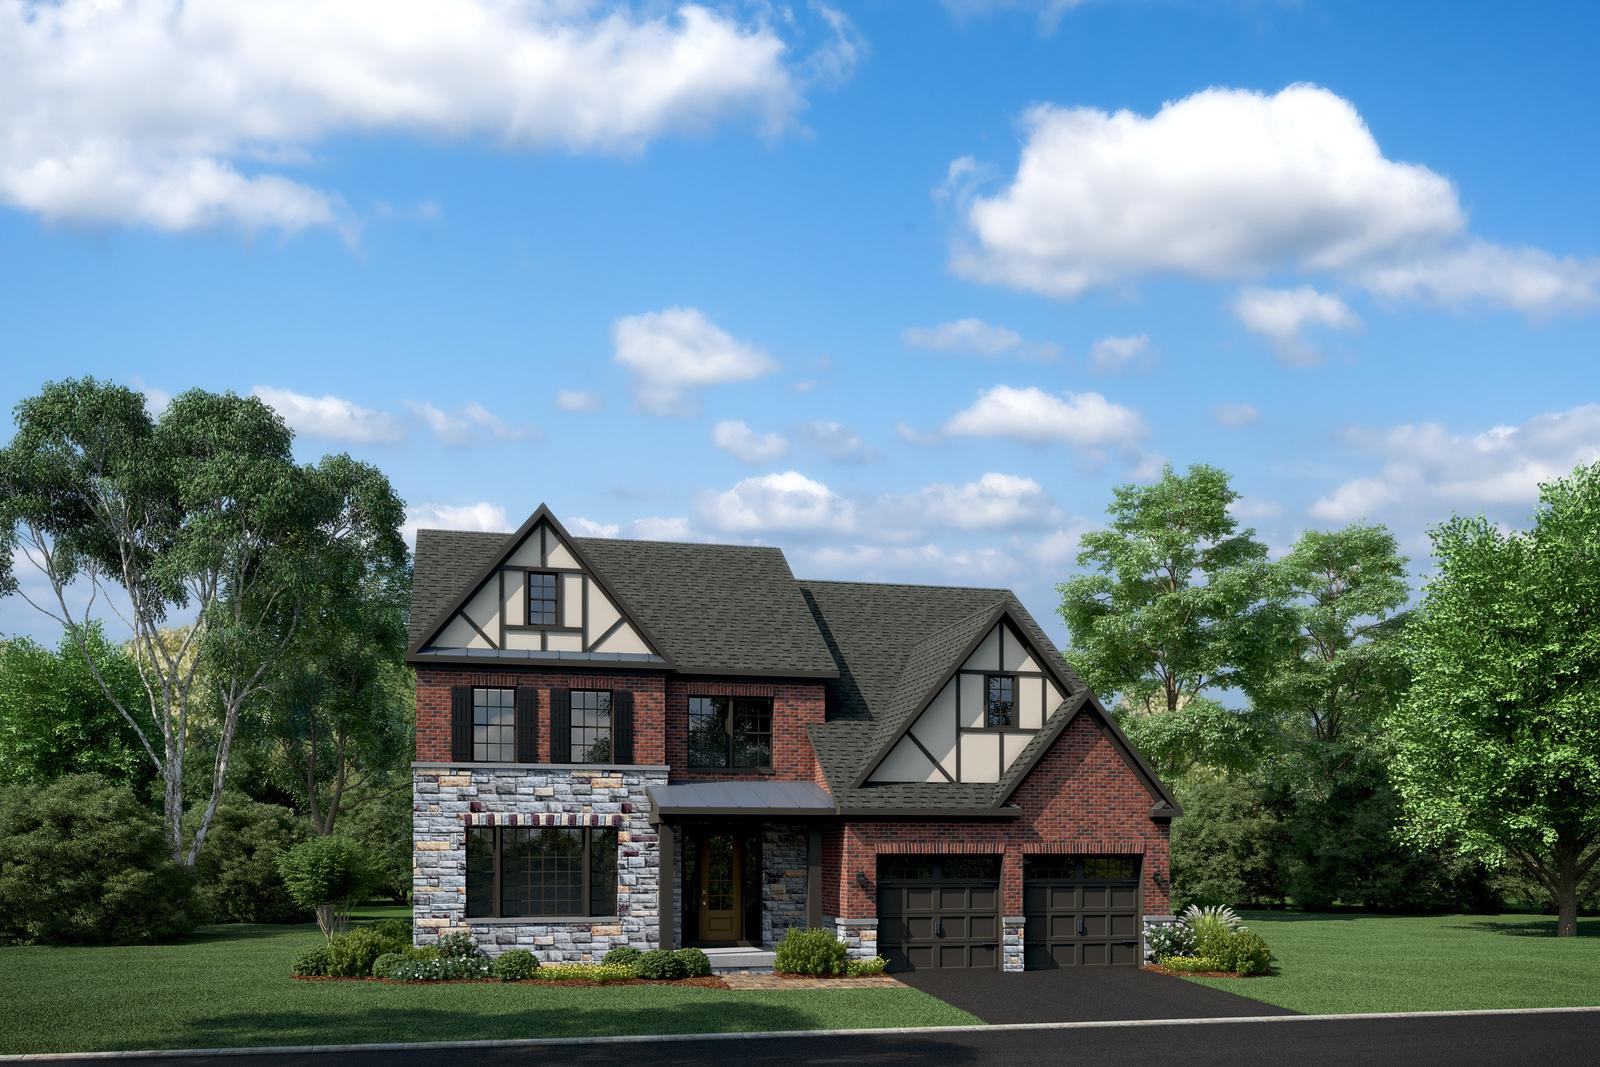 New Bridgewater Home Model For Sale Heartland Homes